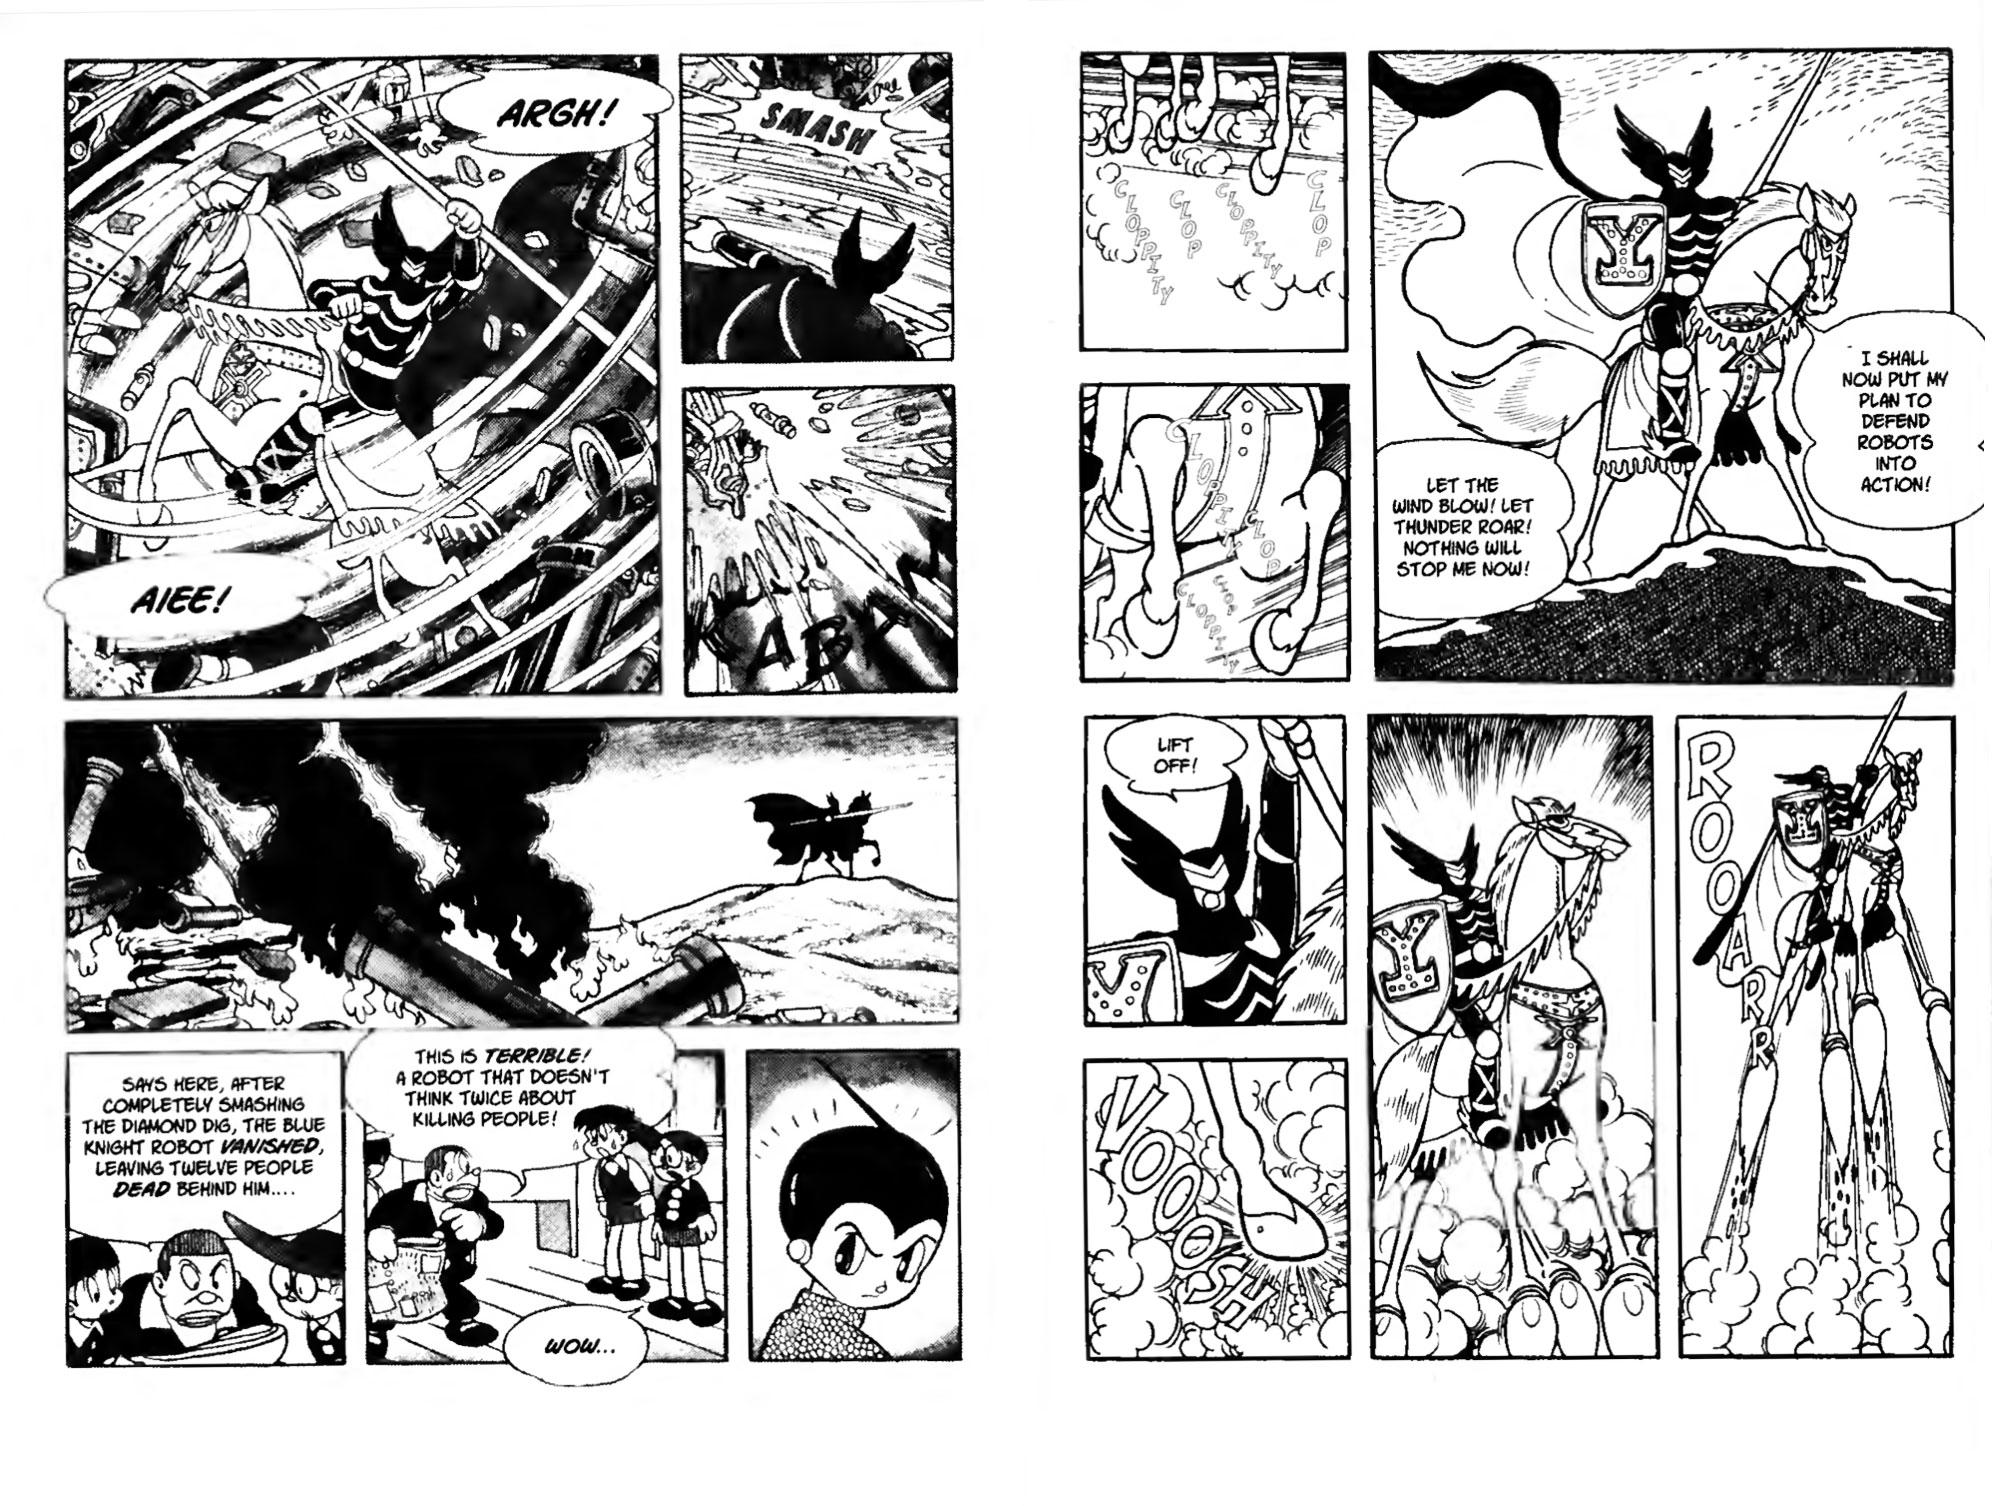 Astro Boy 19 review